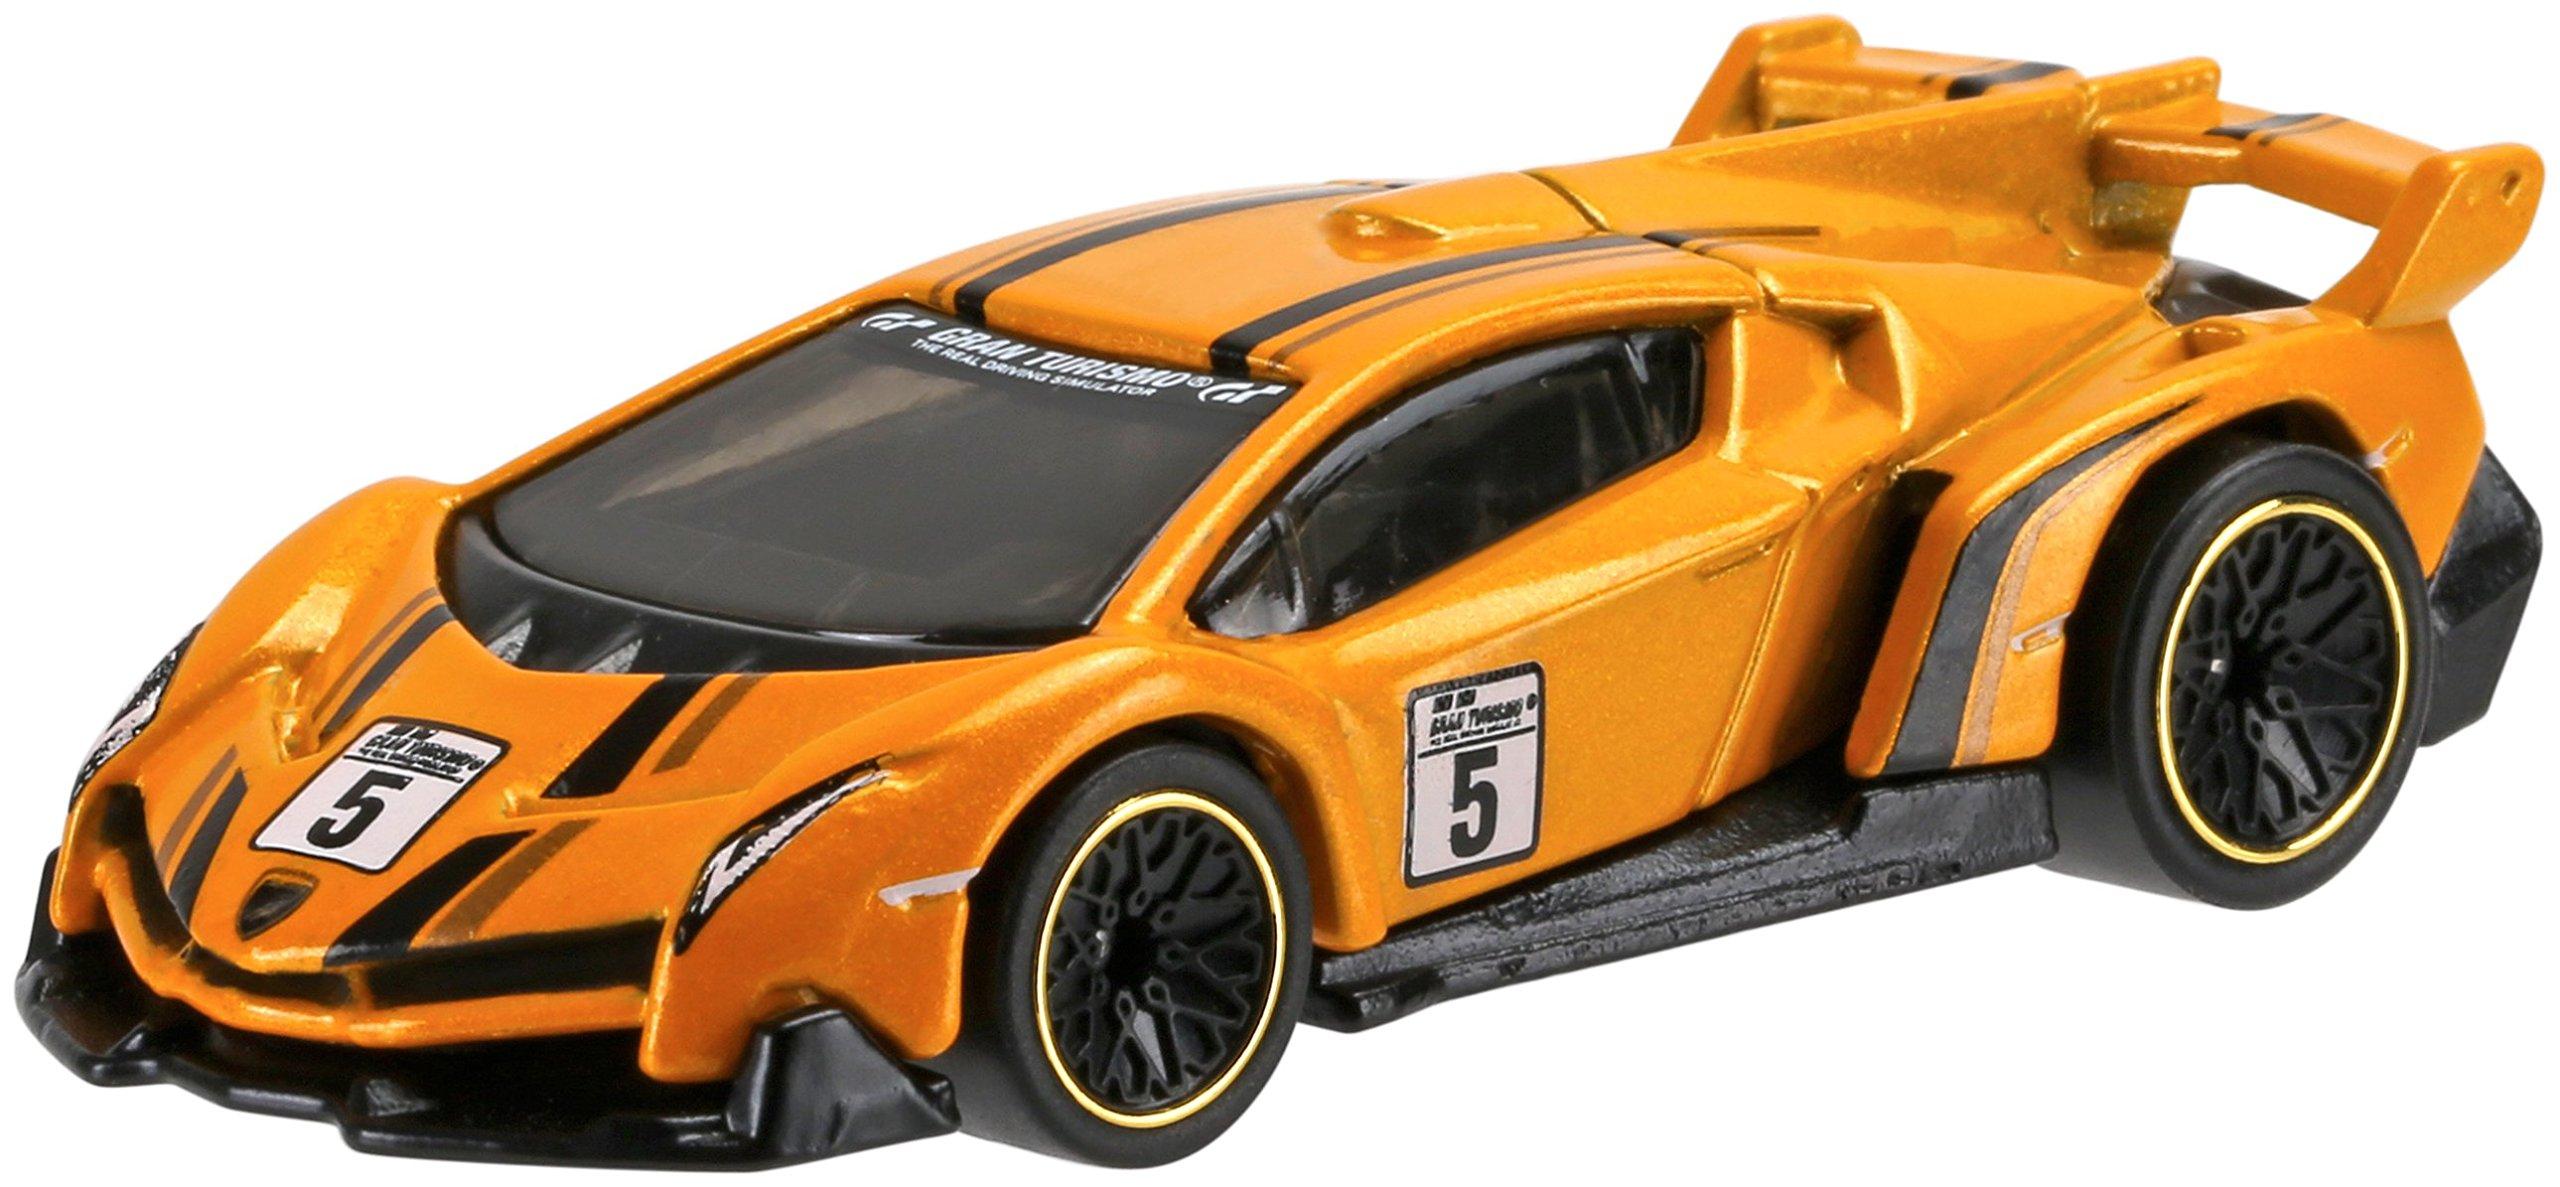 Hot Wheels Retro Entertainment Gran Turismo Lamborghini Veneno Die-Cast Vehículo Escala 4/5, Naranja